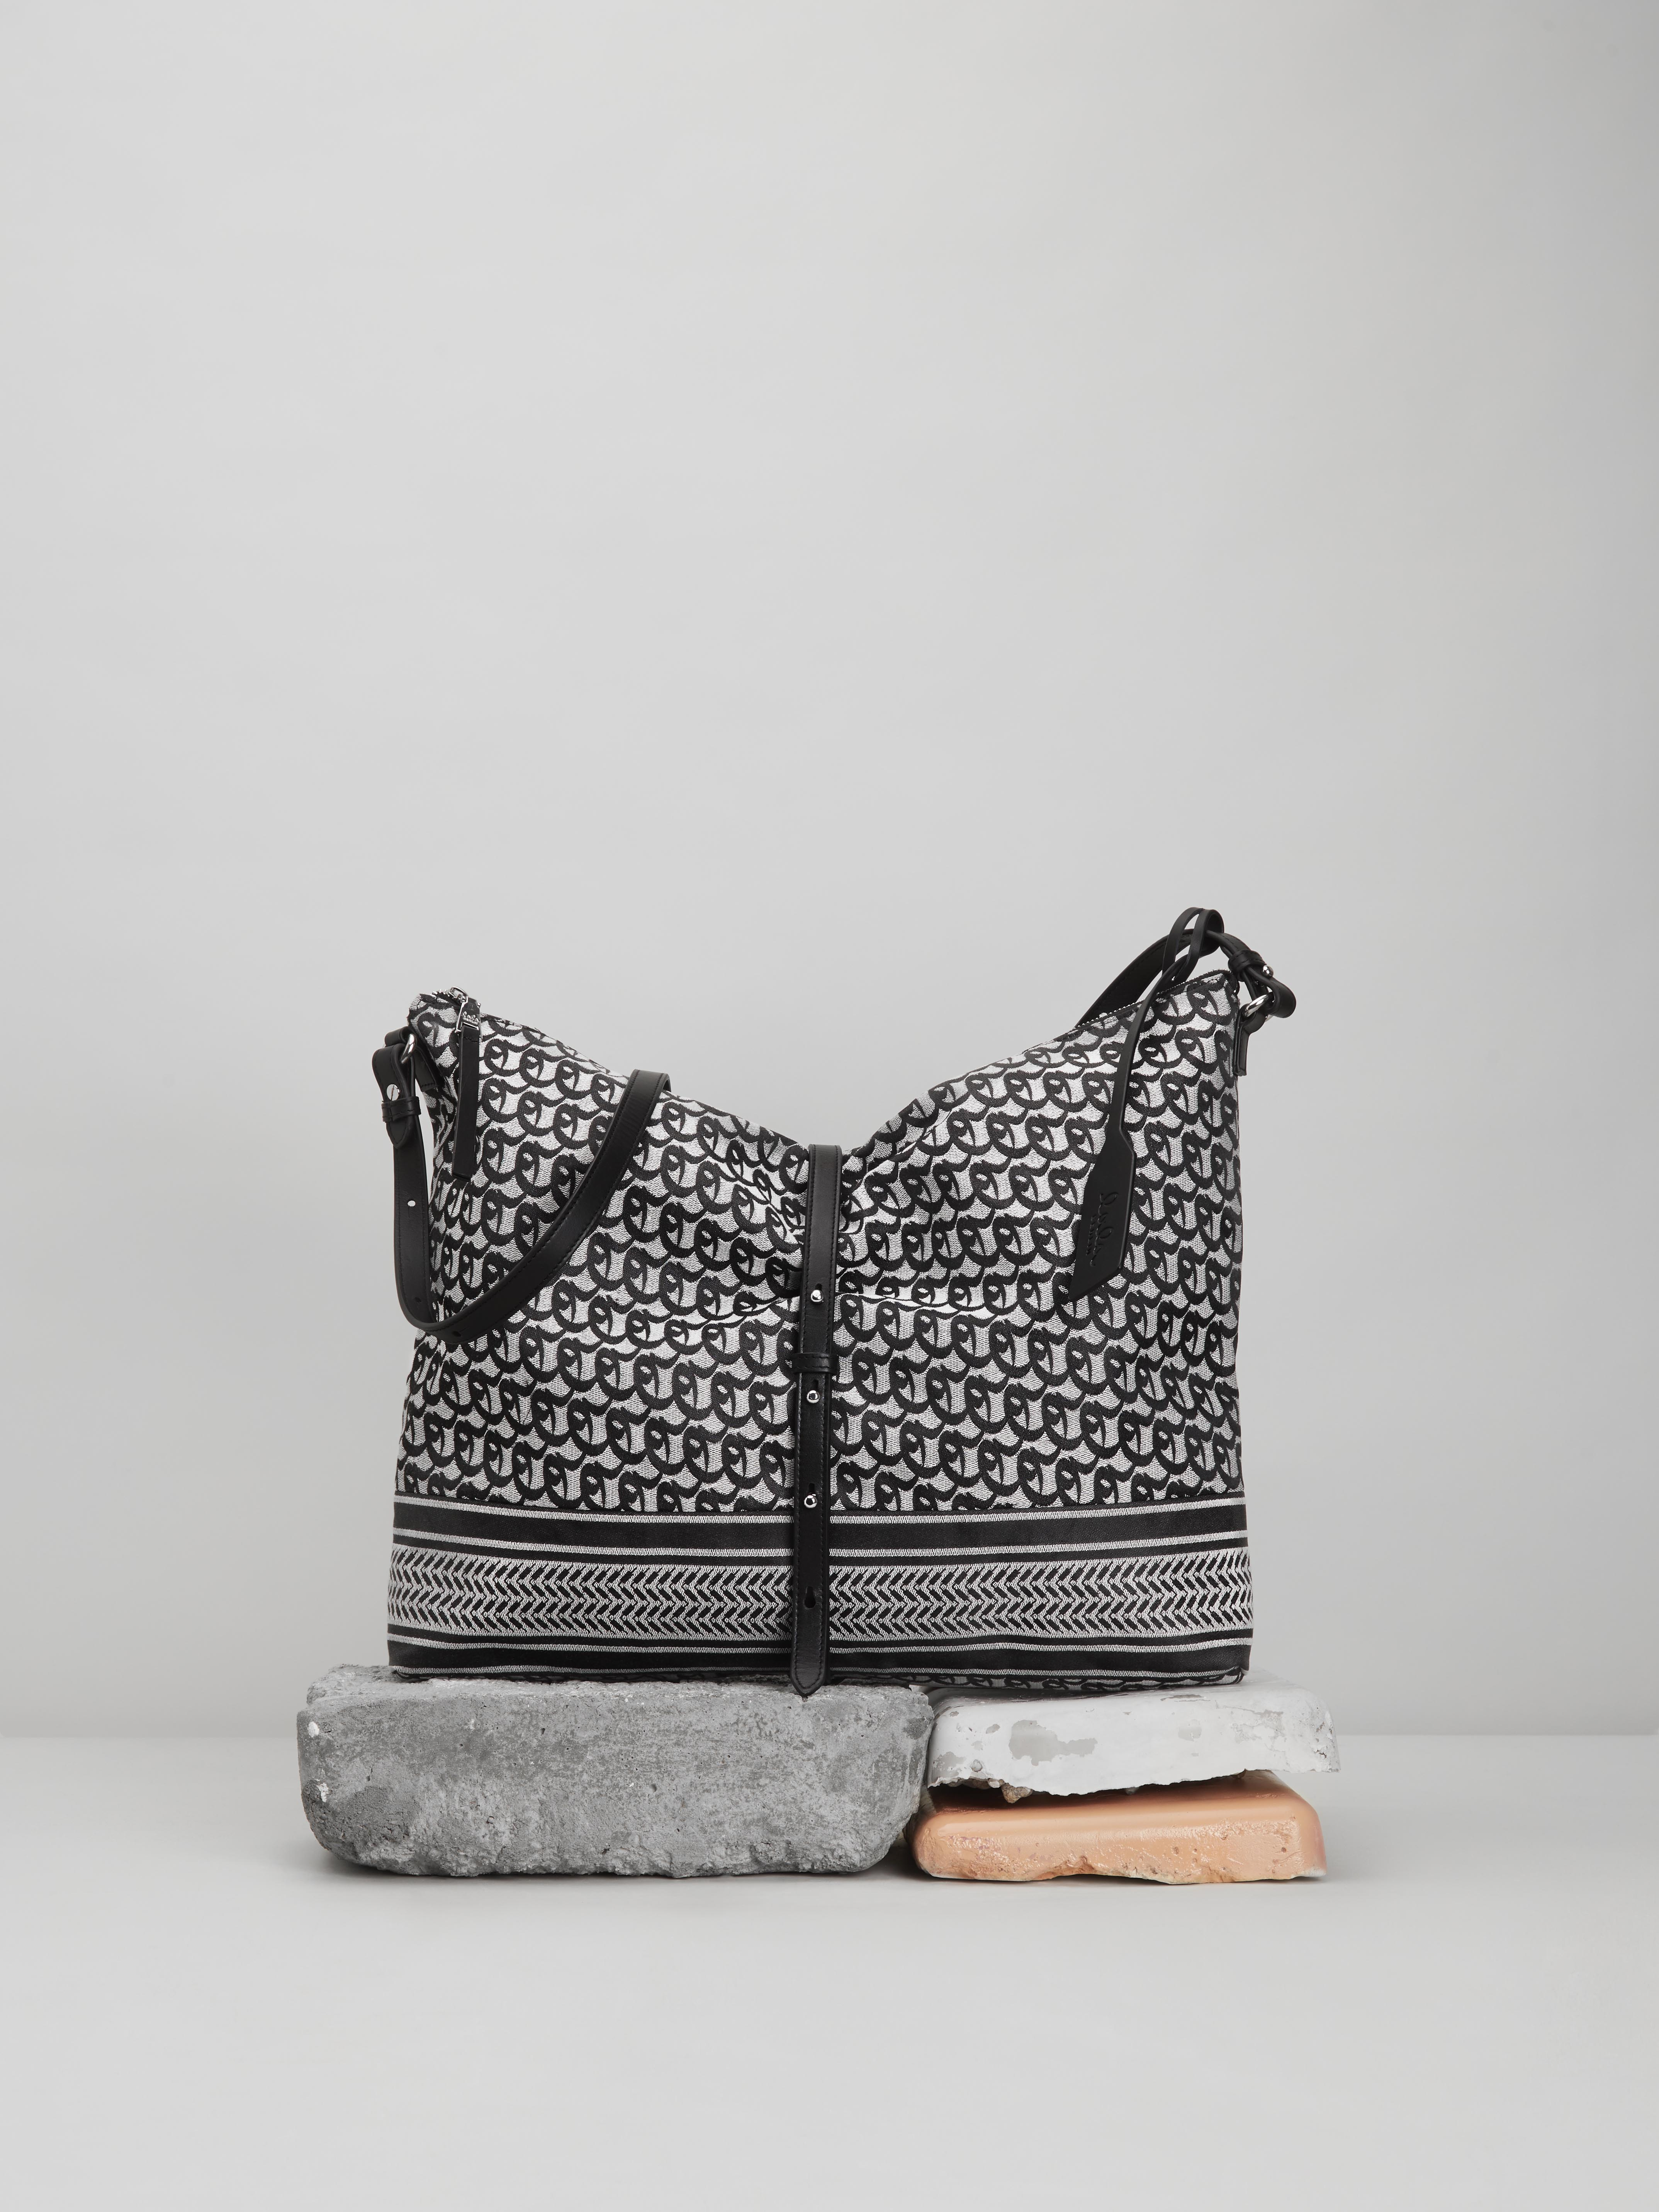 19-01_LALA_BERLIN_12_Big_Pillow_Bag_Anit